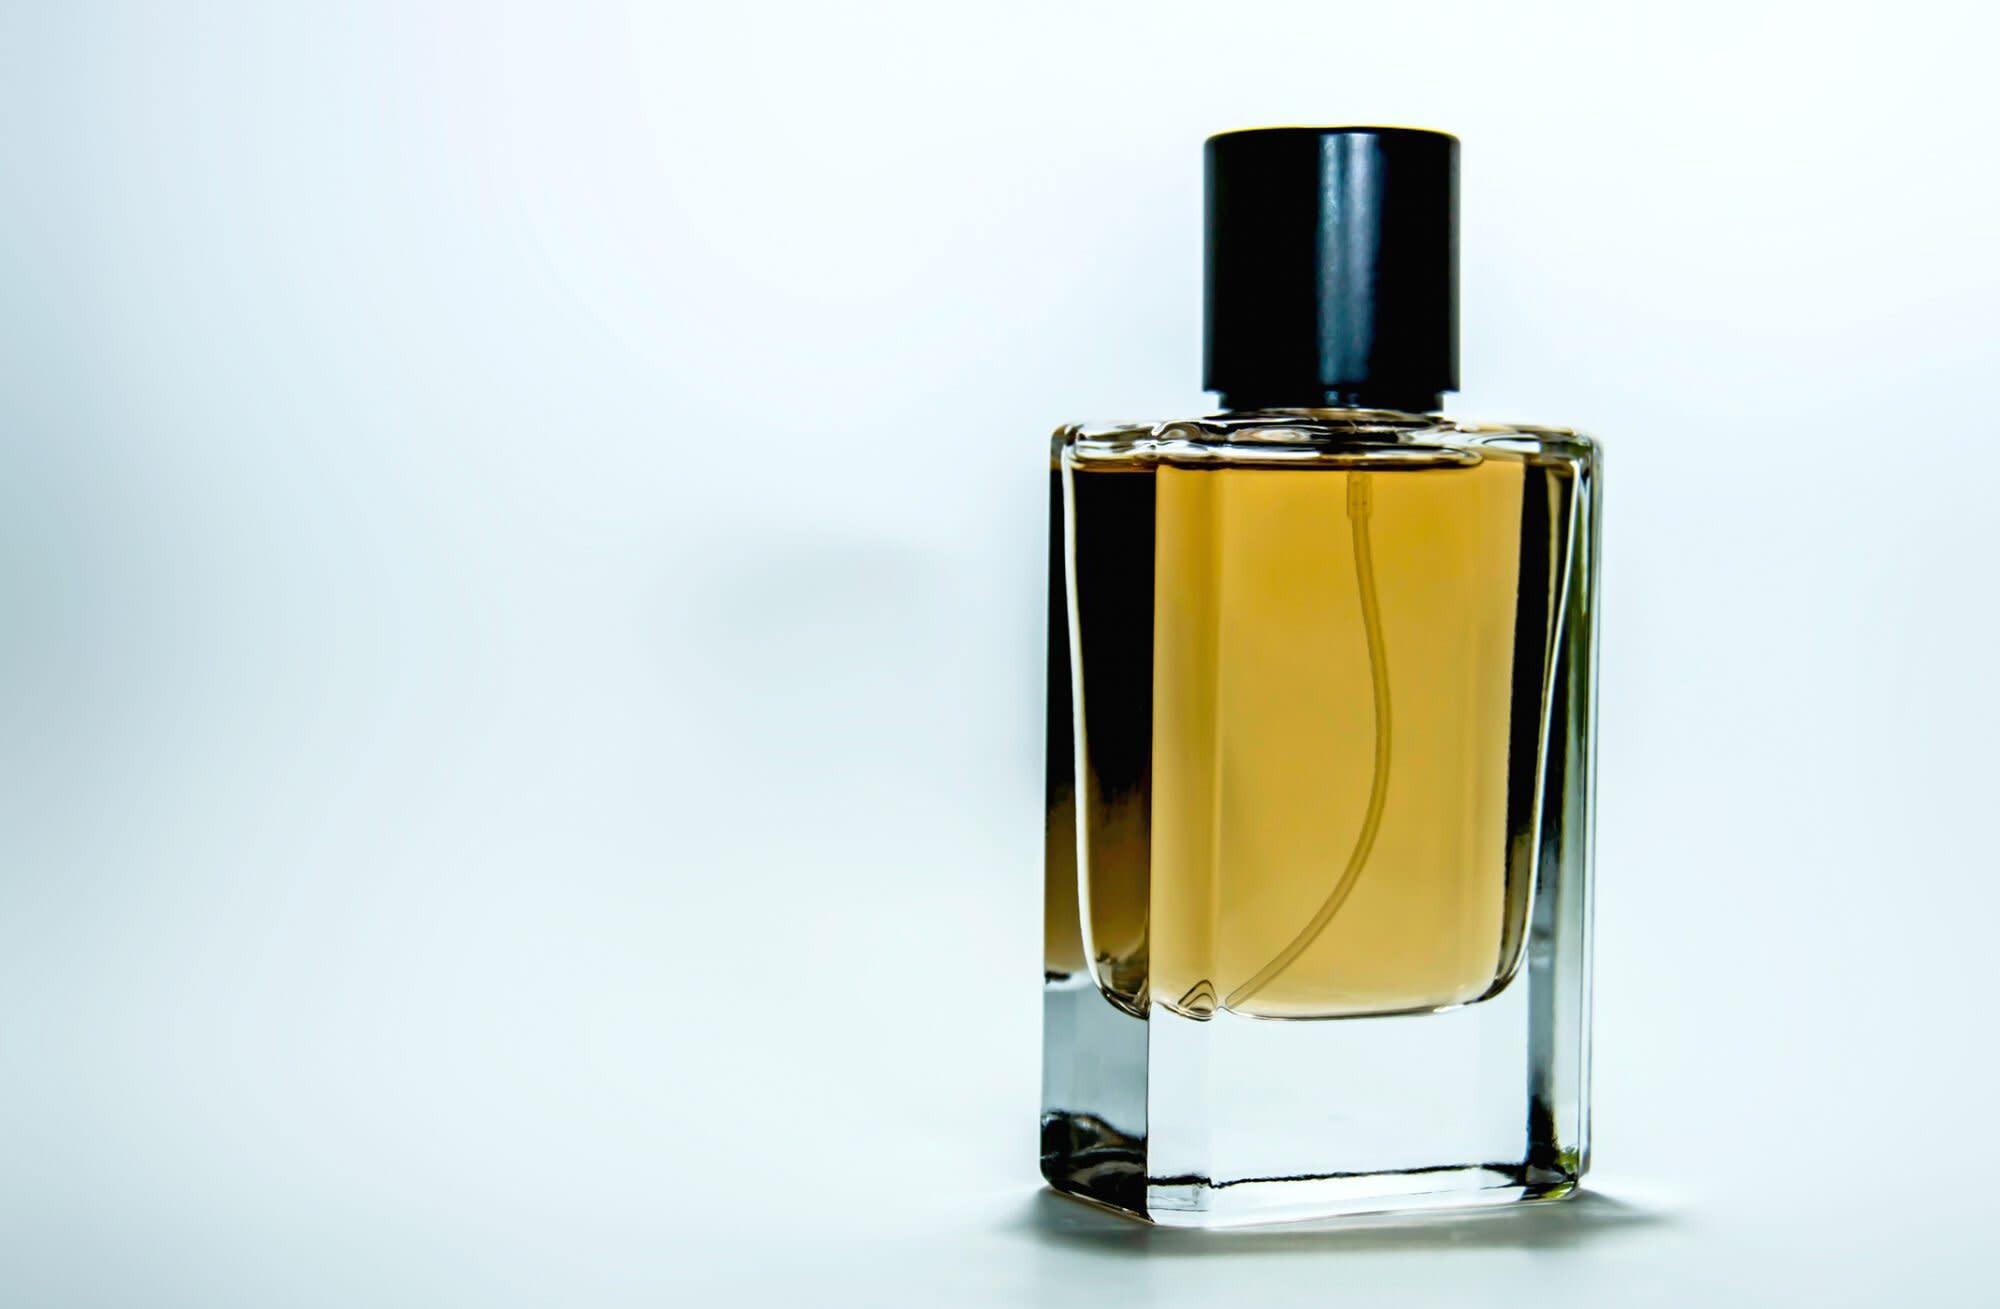 Blackstone bets on perfume maker bee options binary options trading